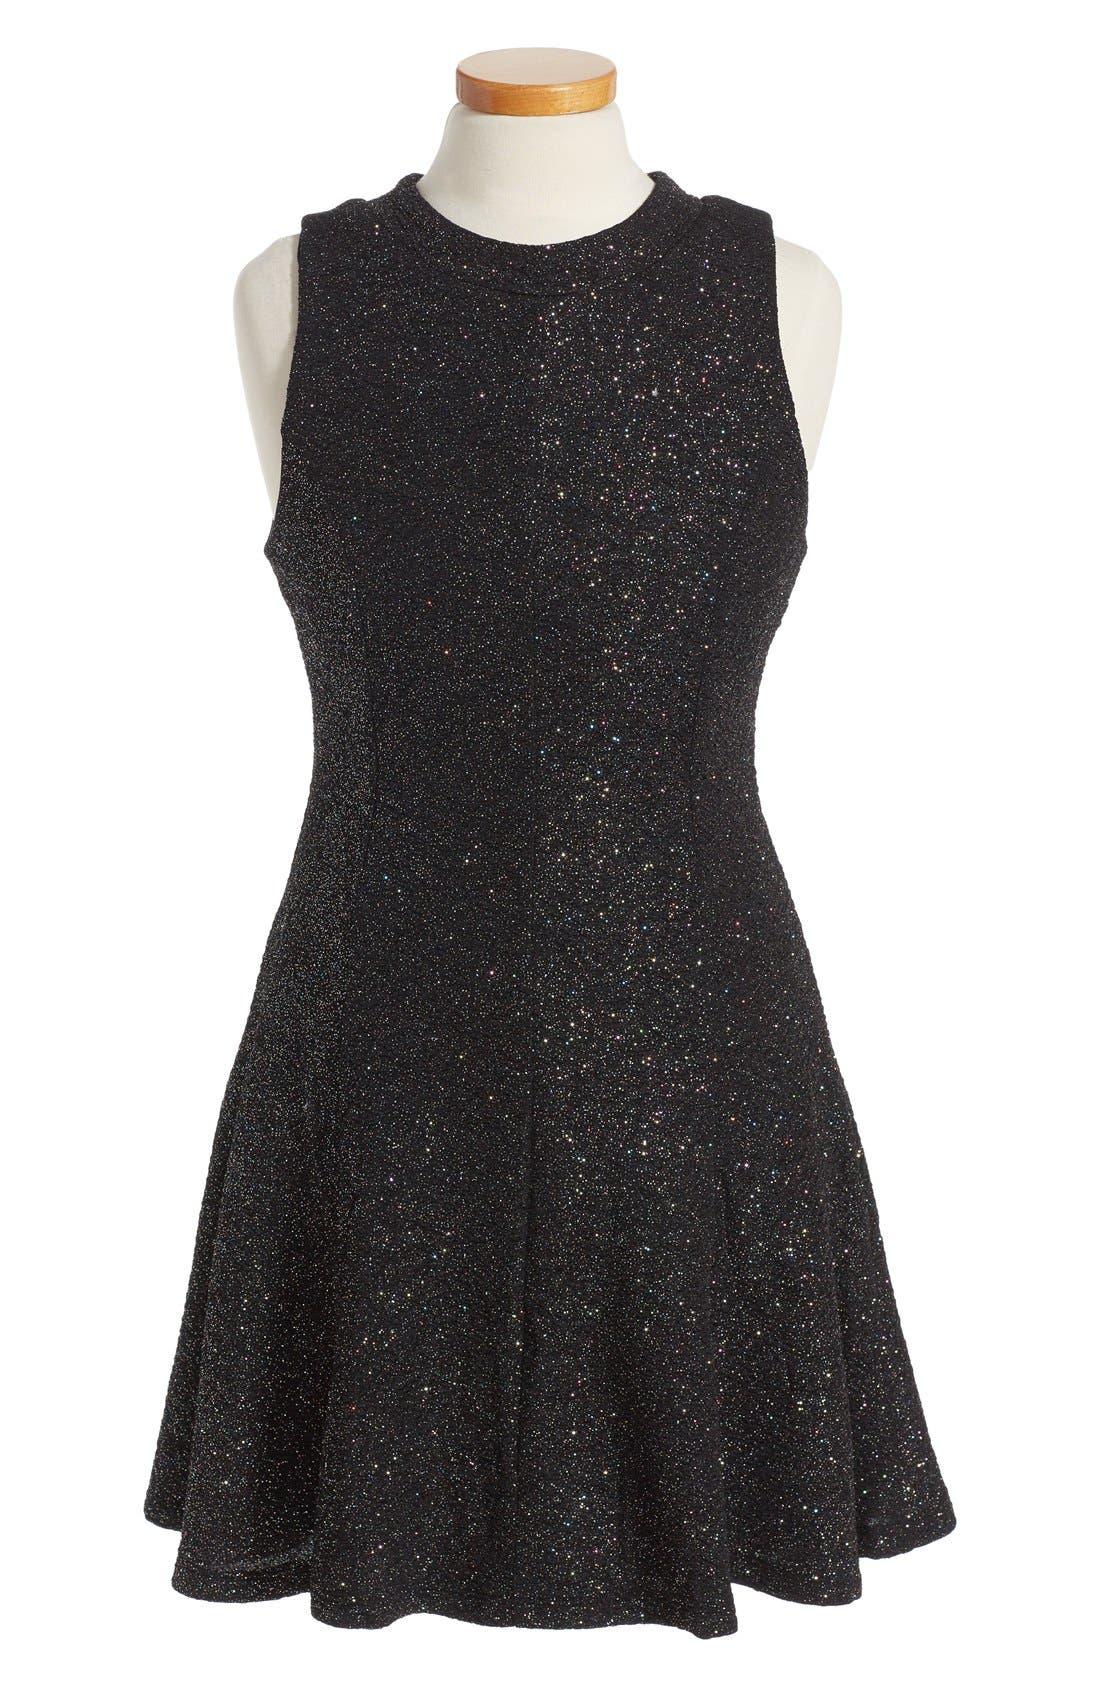 Black dress youth 6x